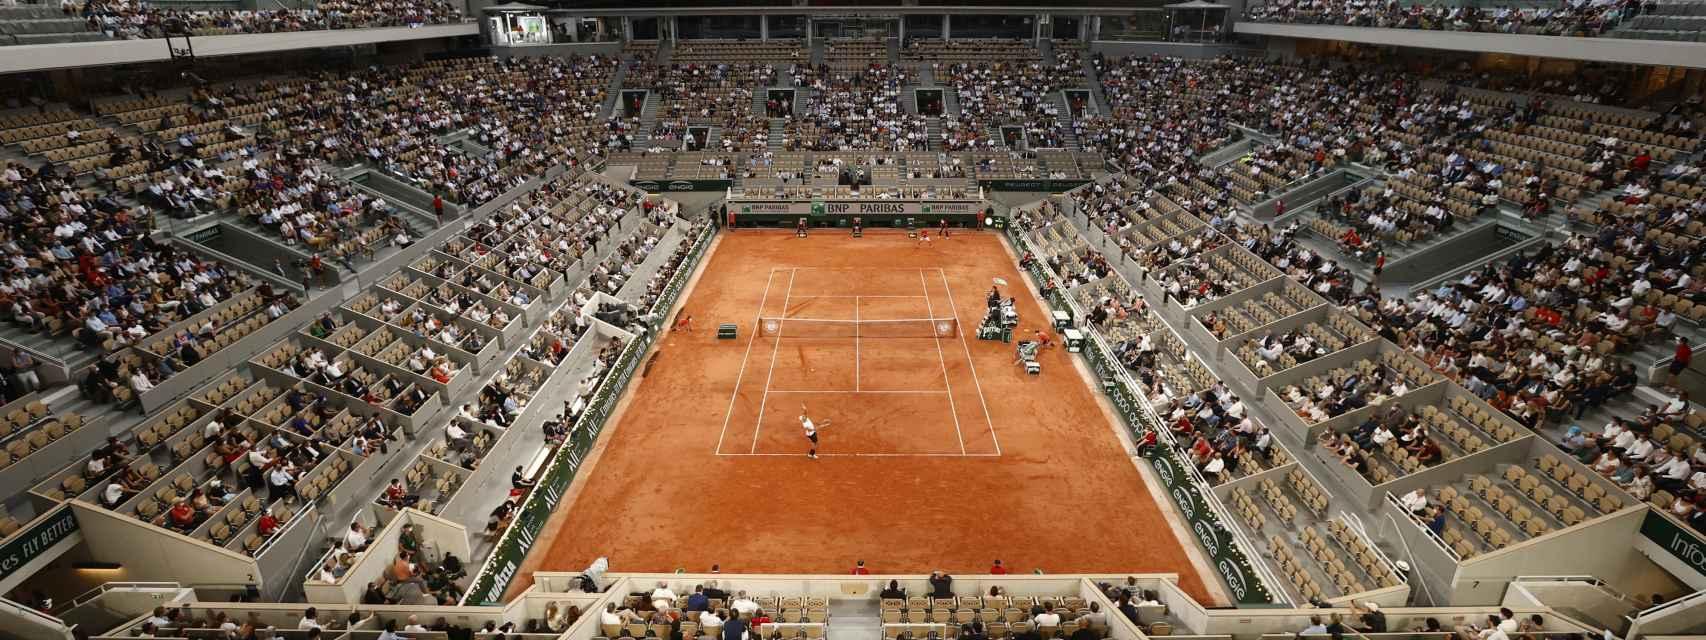 Pista central de Roland Garros